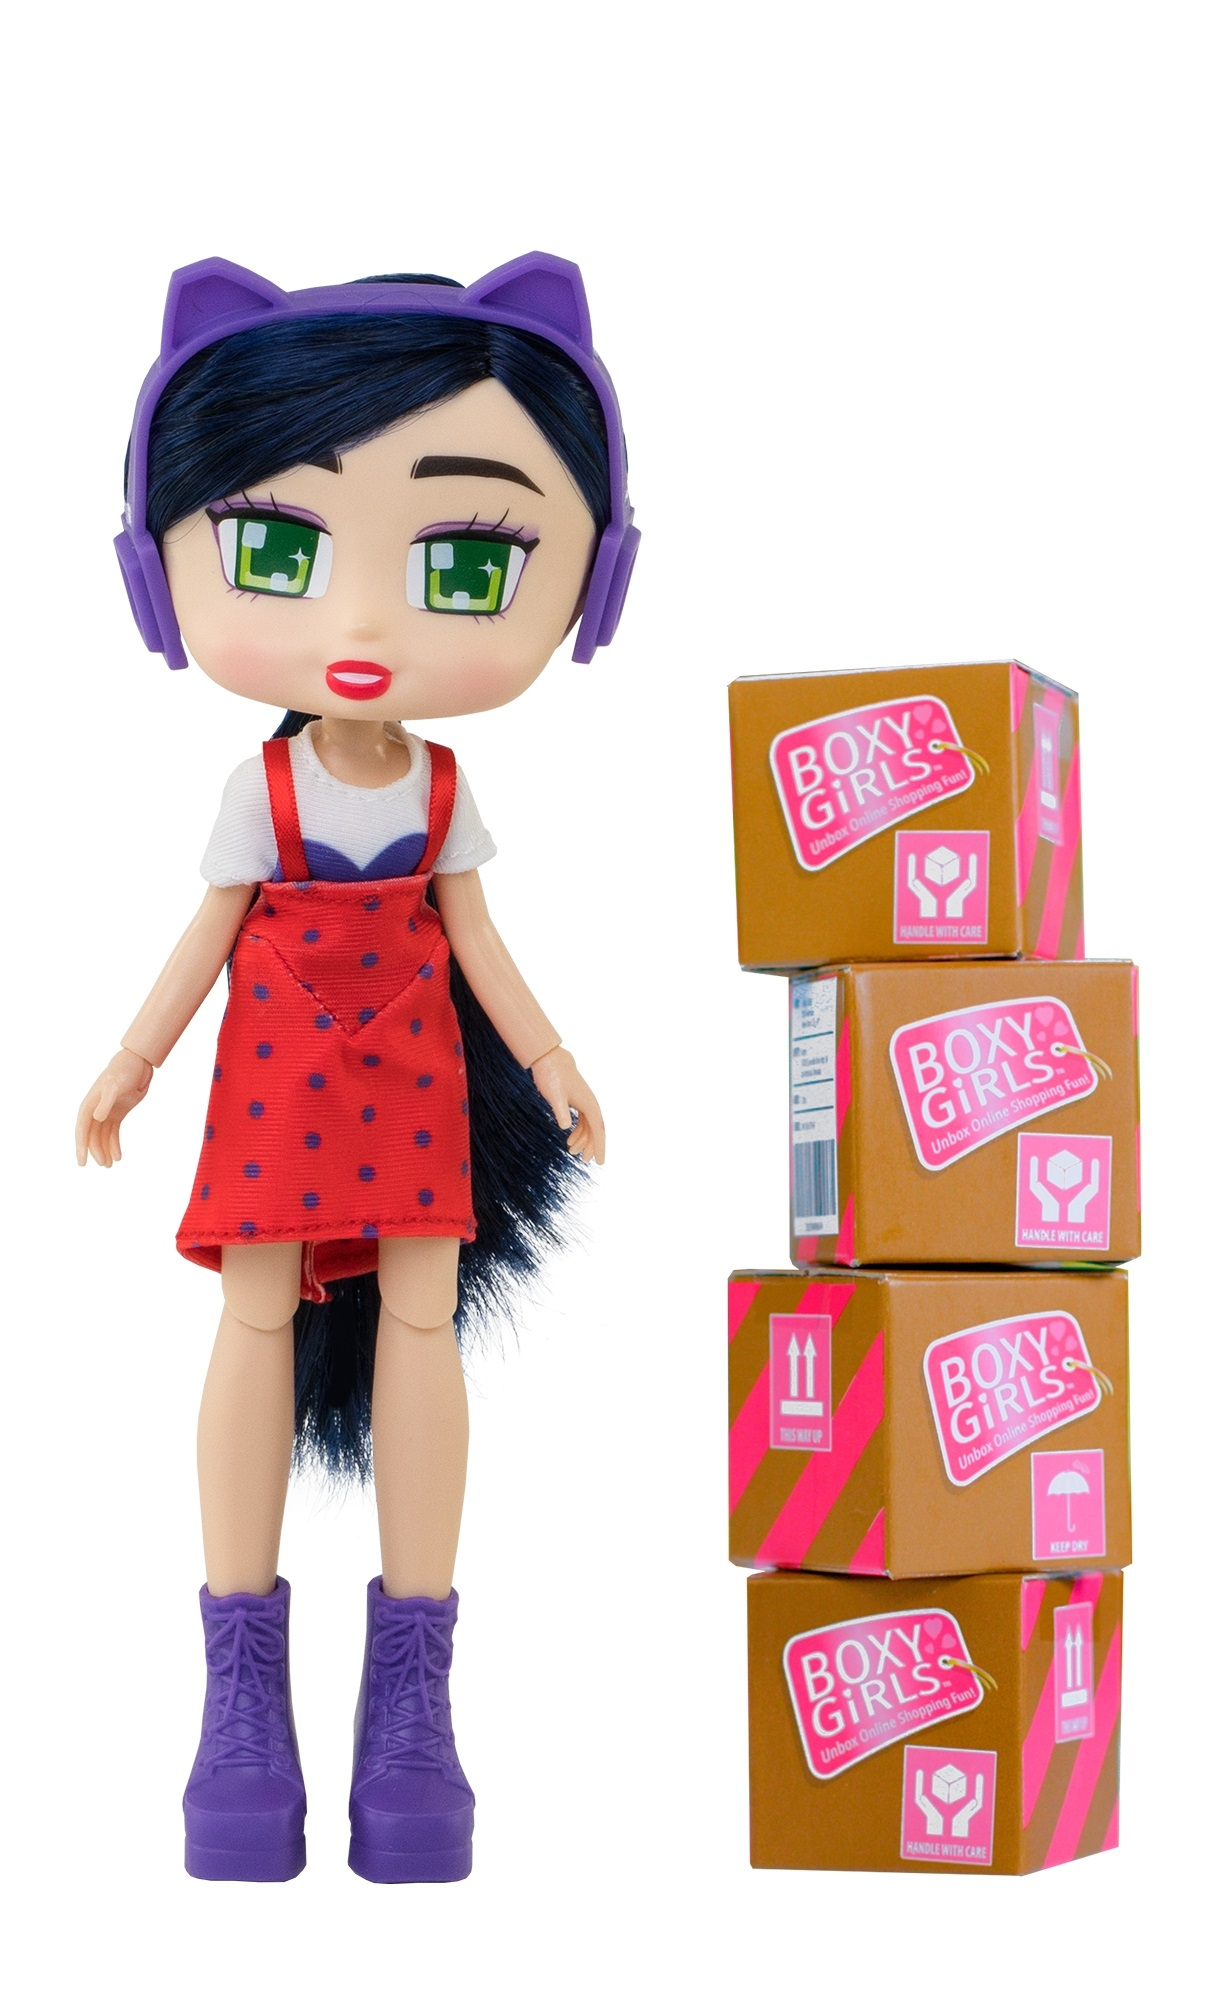 Кукла 1toy Boxy Girls Riley, брюнетка с аксессуарами 20 см кукла 1toy boxy girls willa 20 см с аксессуарами в 4 х коробочка 4х4х4 см кор 18х7 5х27 см